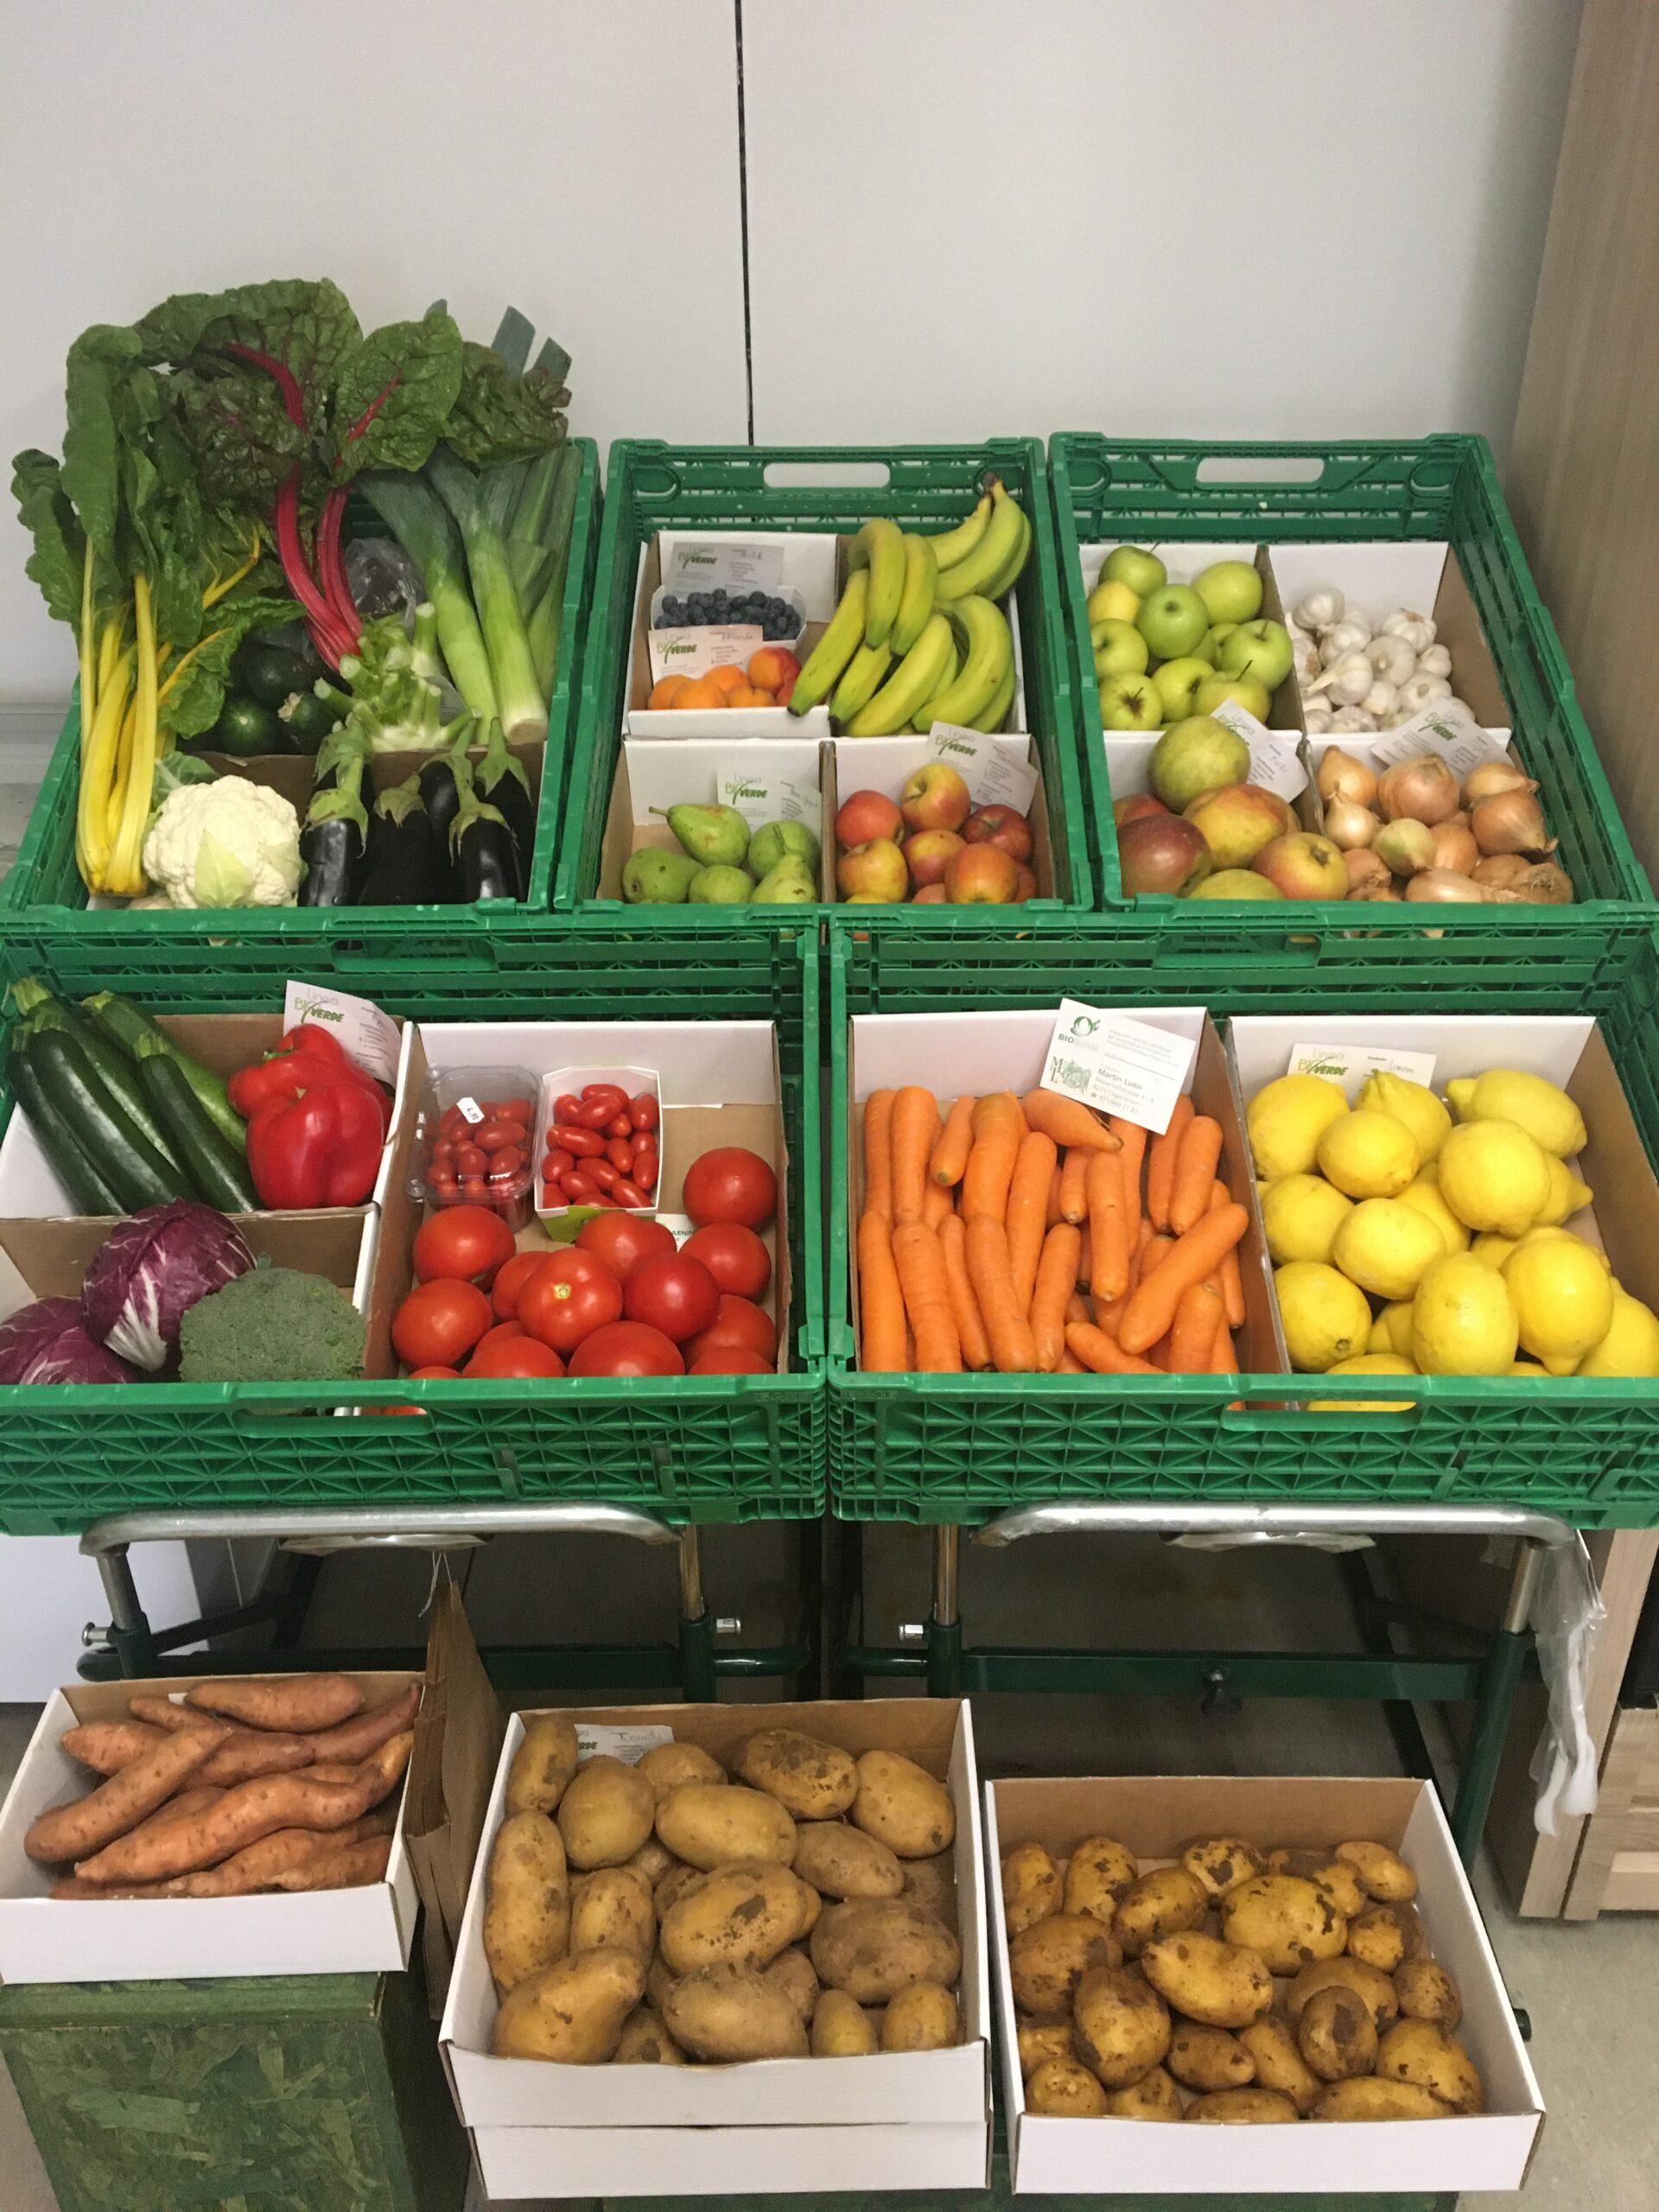 Verdura e frutta bio